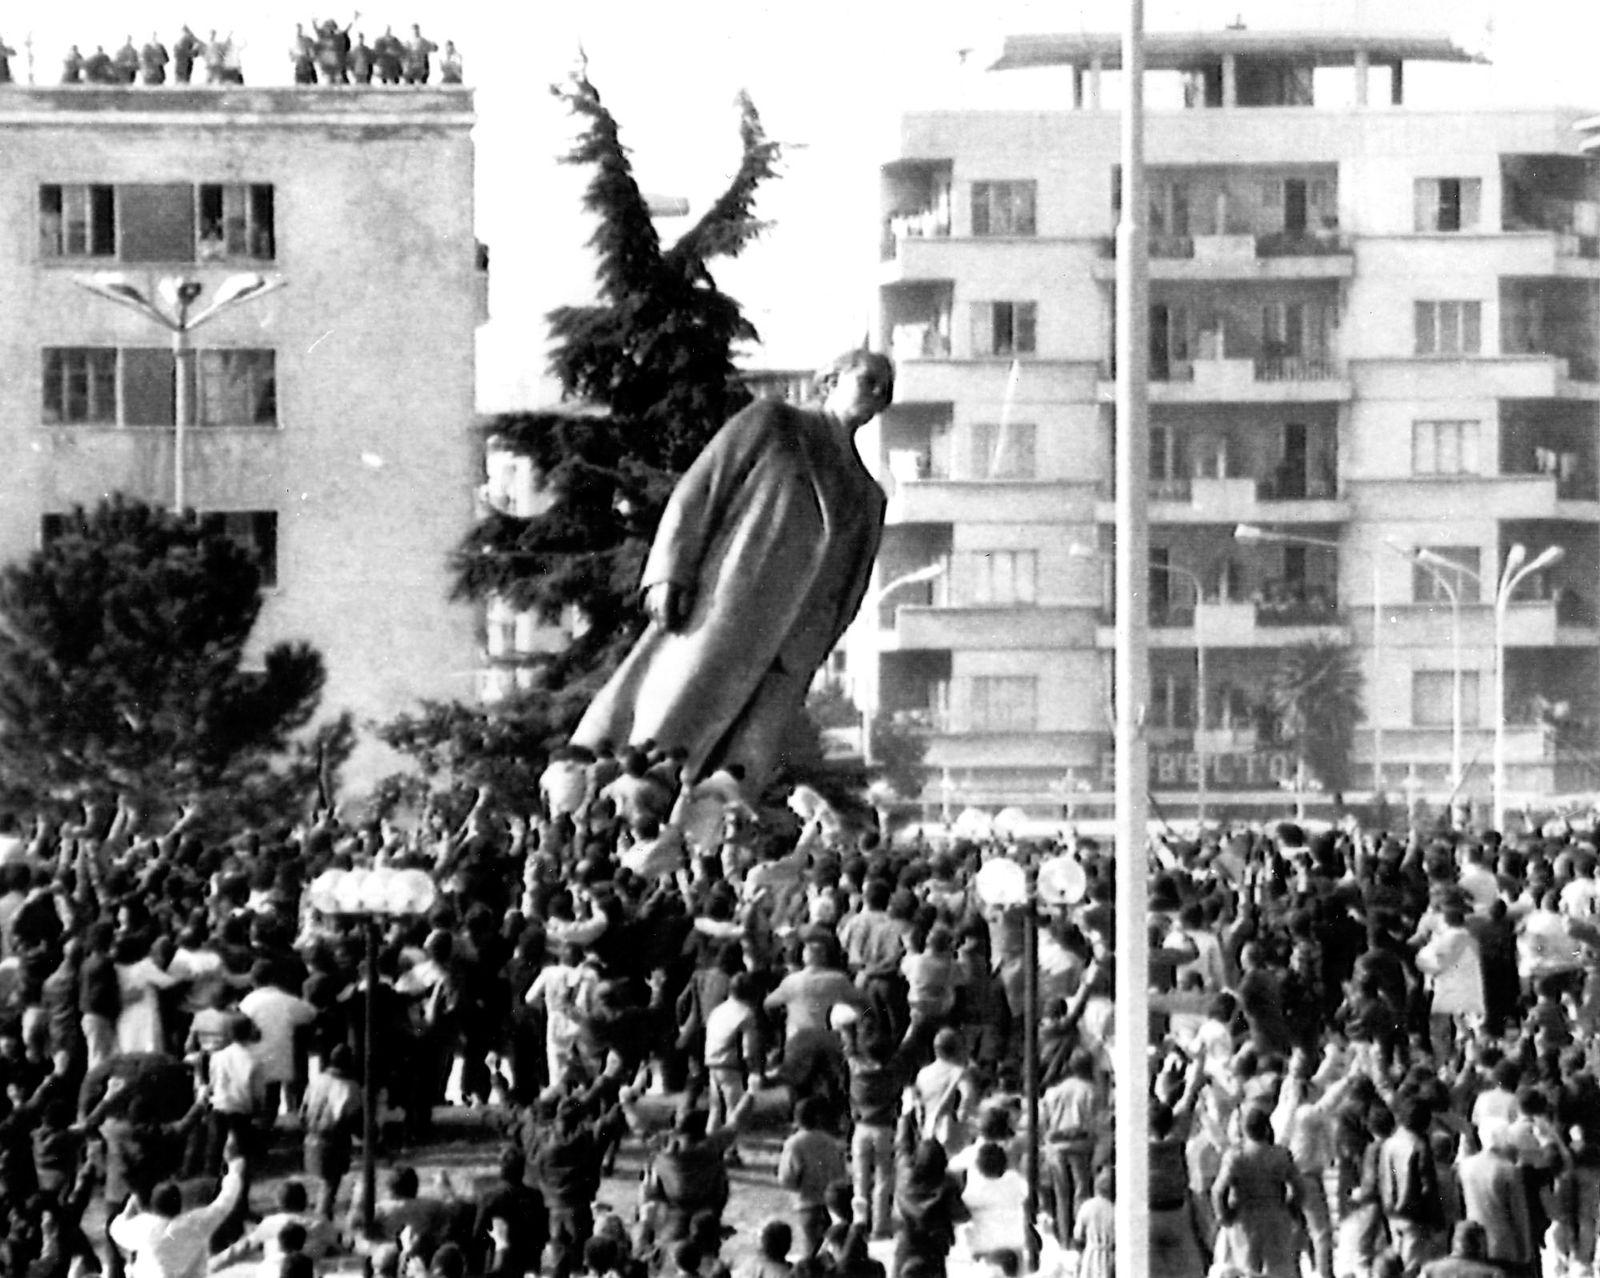 Sturm auf Botschaft in Tirana 1990 / Statue Enver Hoxha